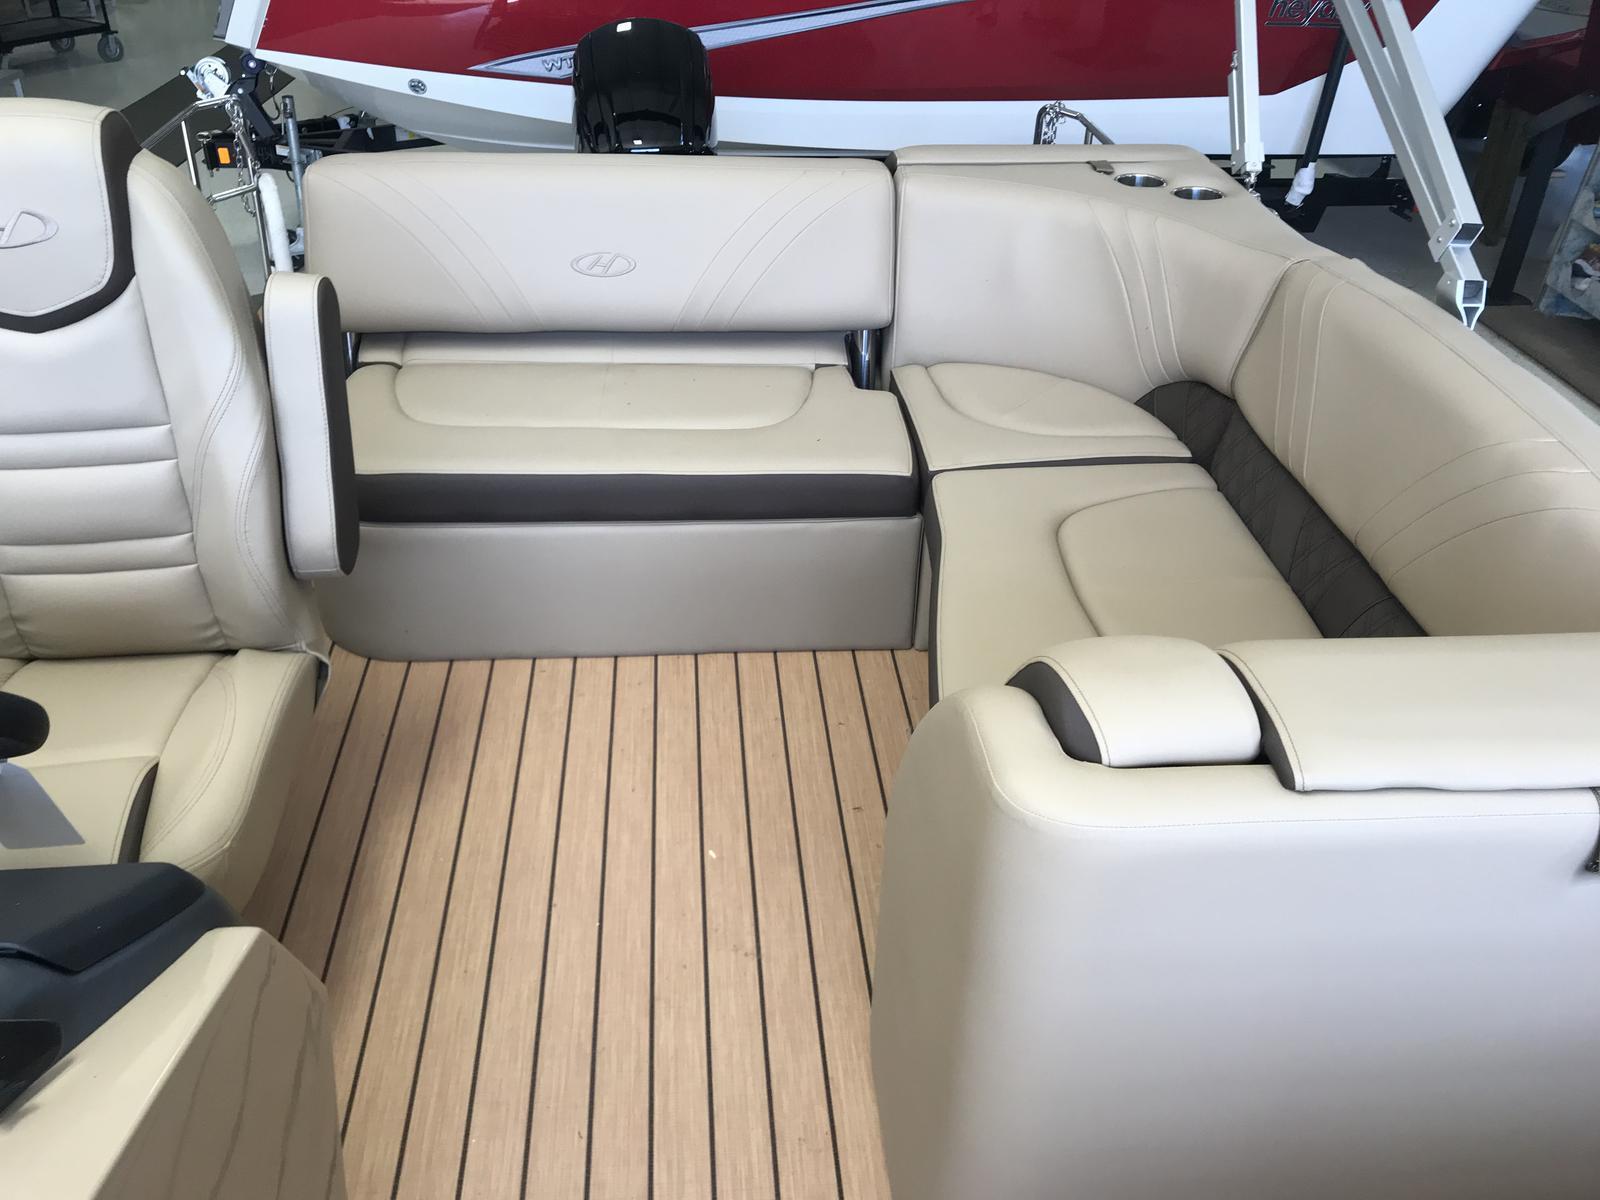 2019 Harris Solstice 220 for sale in Howell, MI  Wilson Marine